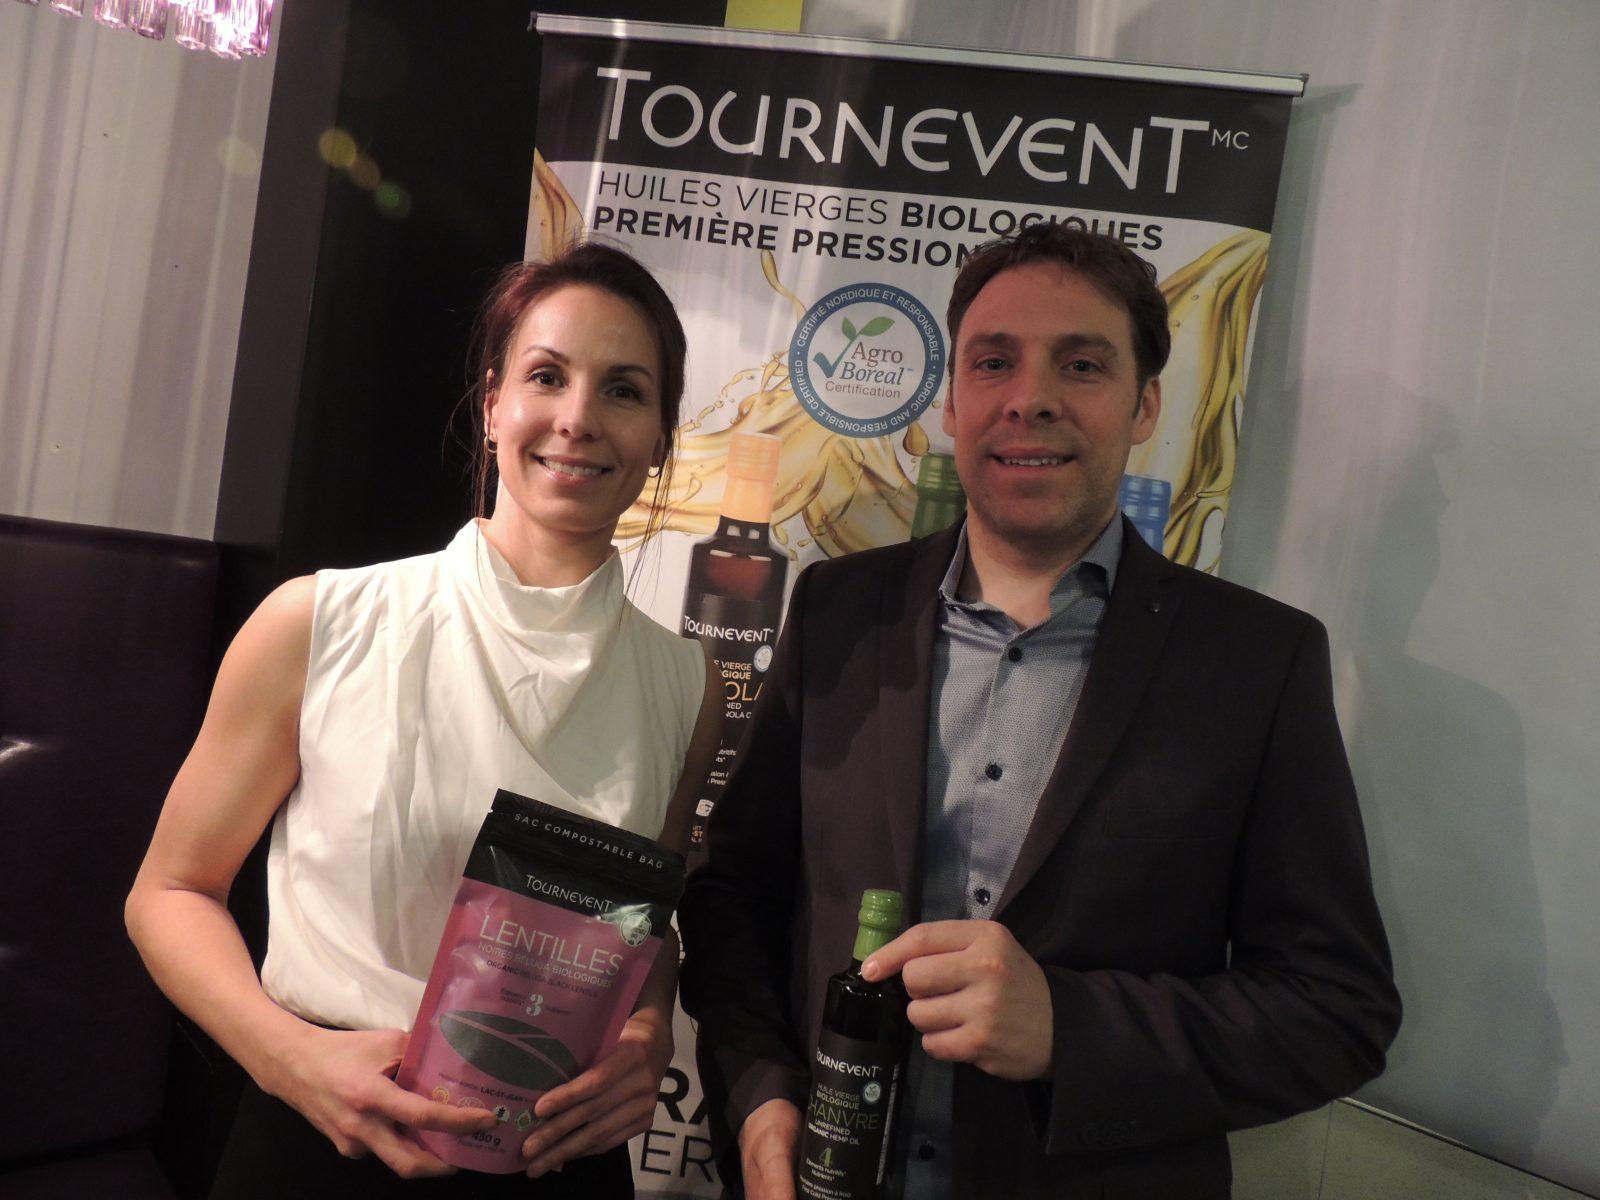 La ferme Tournevent lance sa marque de commerce TournevenT™